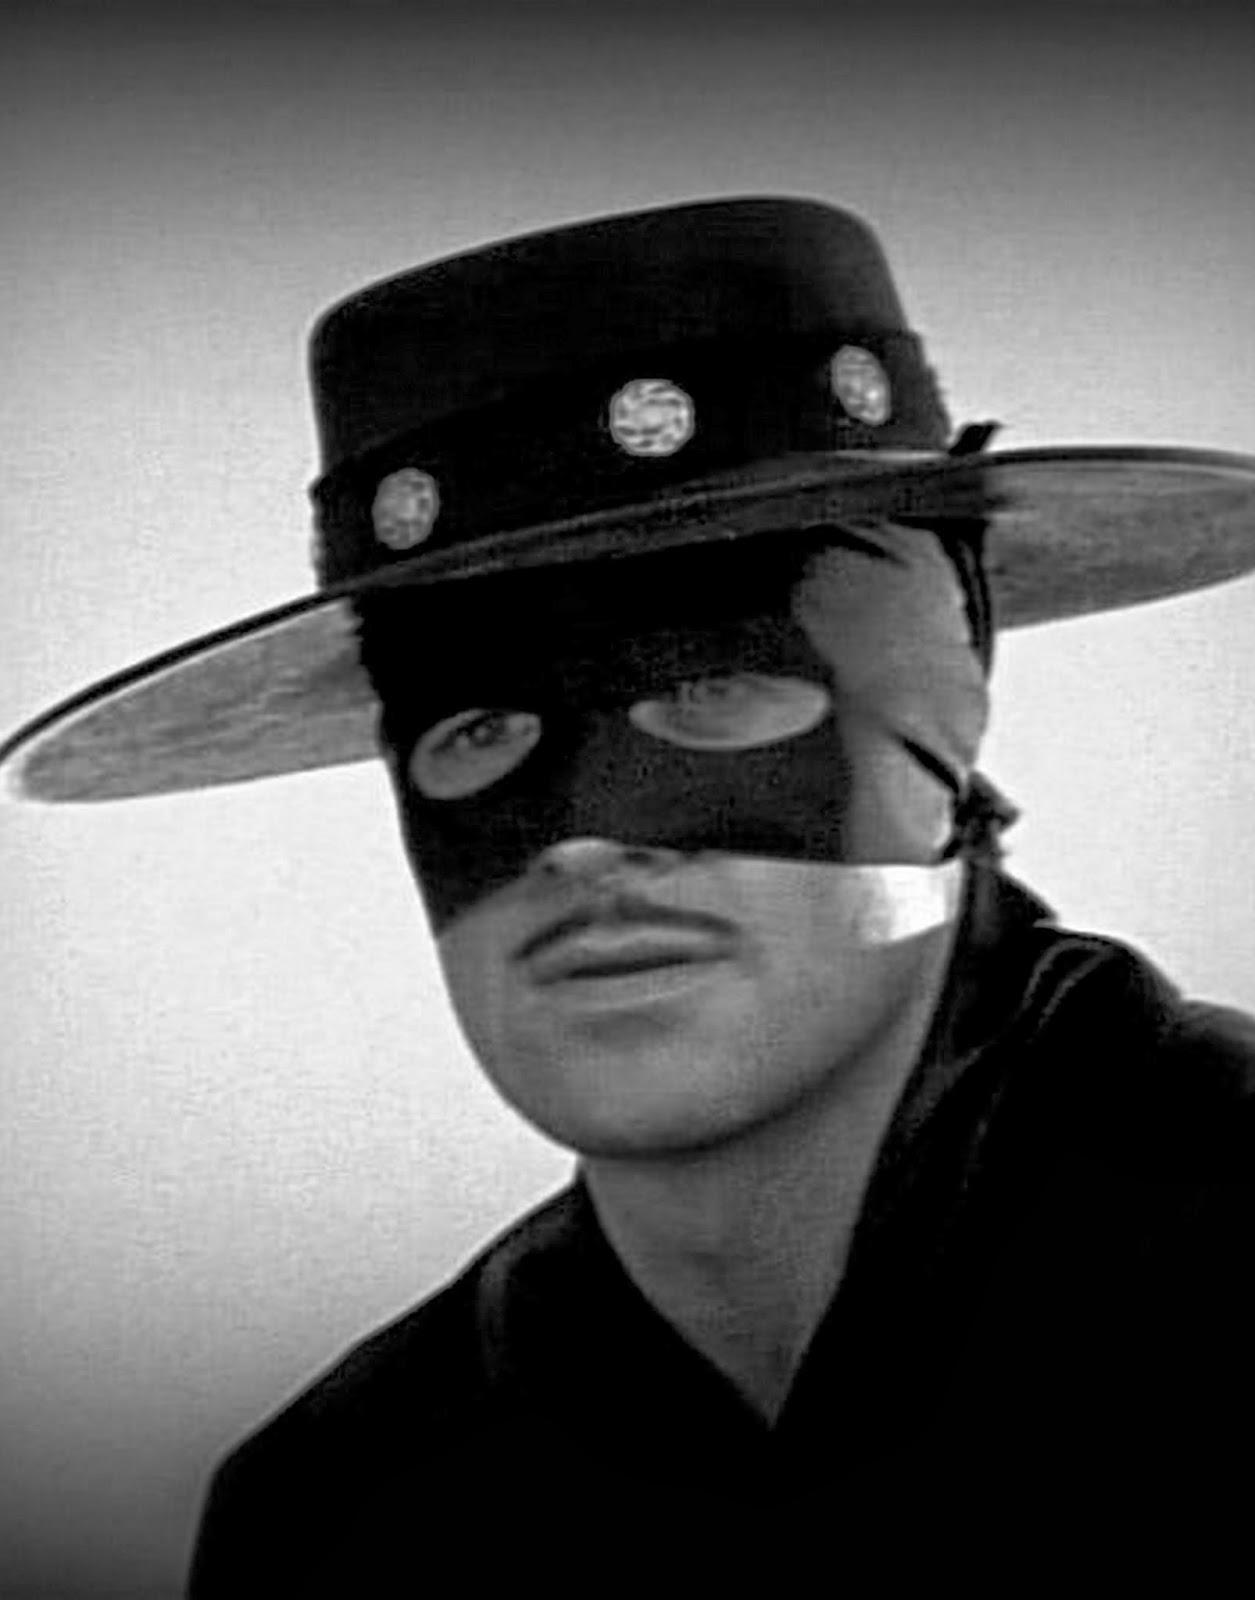 http://4.bp.blogspot.com/-4V4fCDvLDuc/UvhdDidsboI/AAAAAAAAAwA/hWKeeVNZ-ps/s1600/Zorro+Actor+Duncan+Regehr.jpg